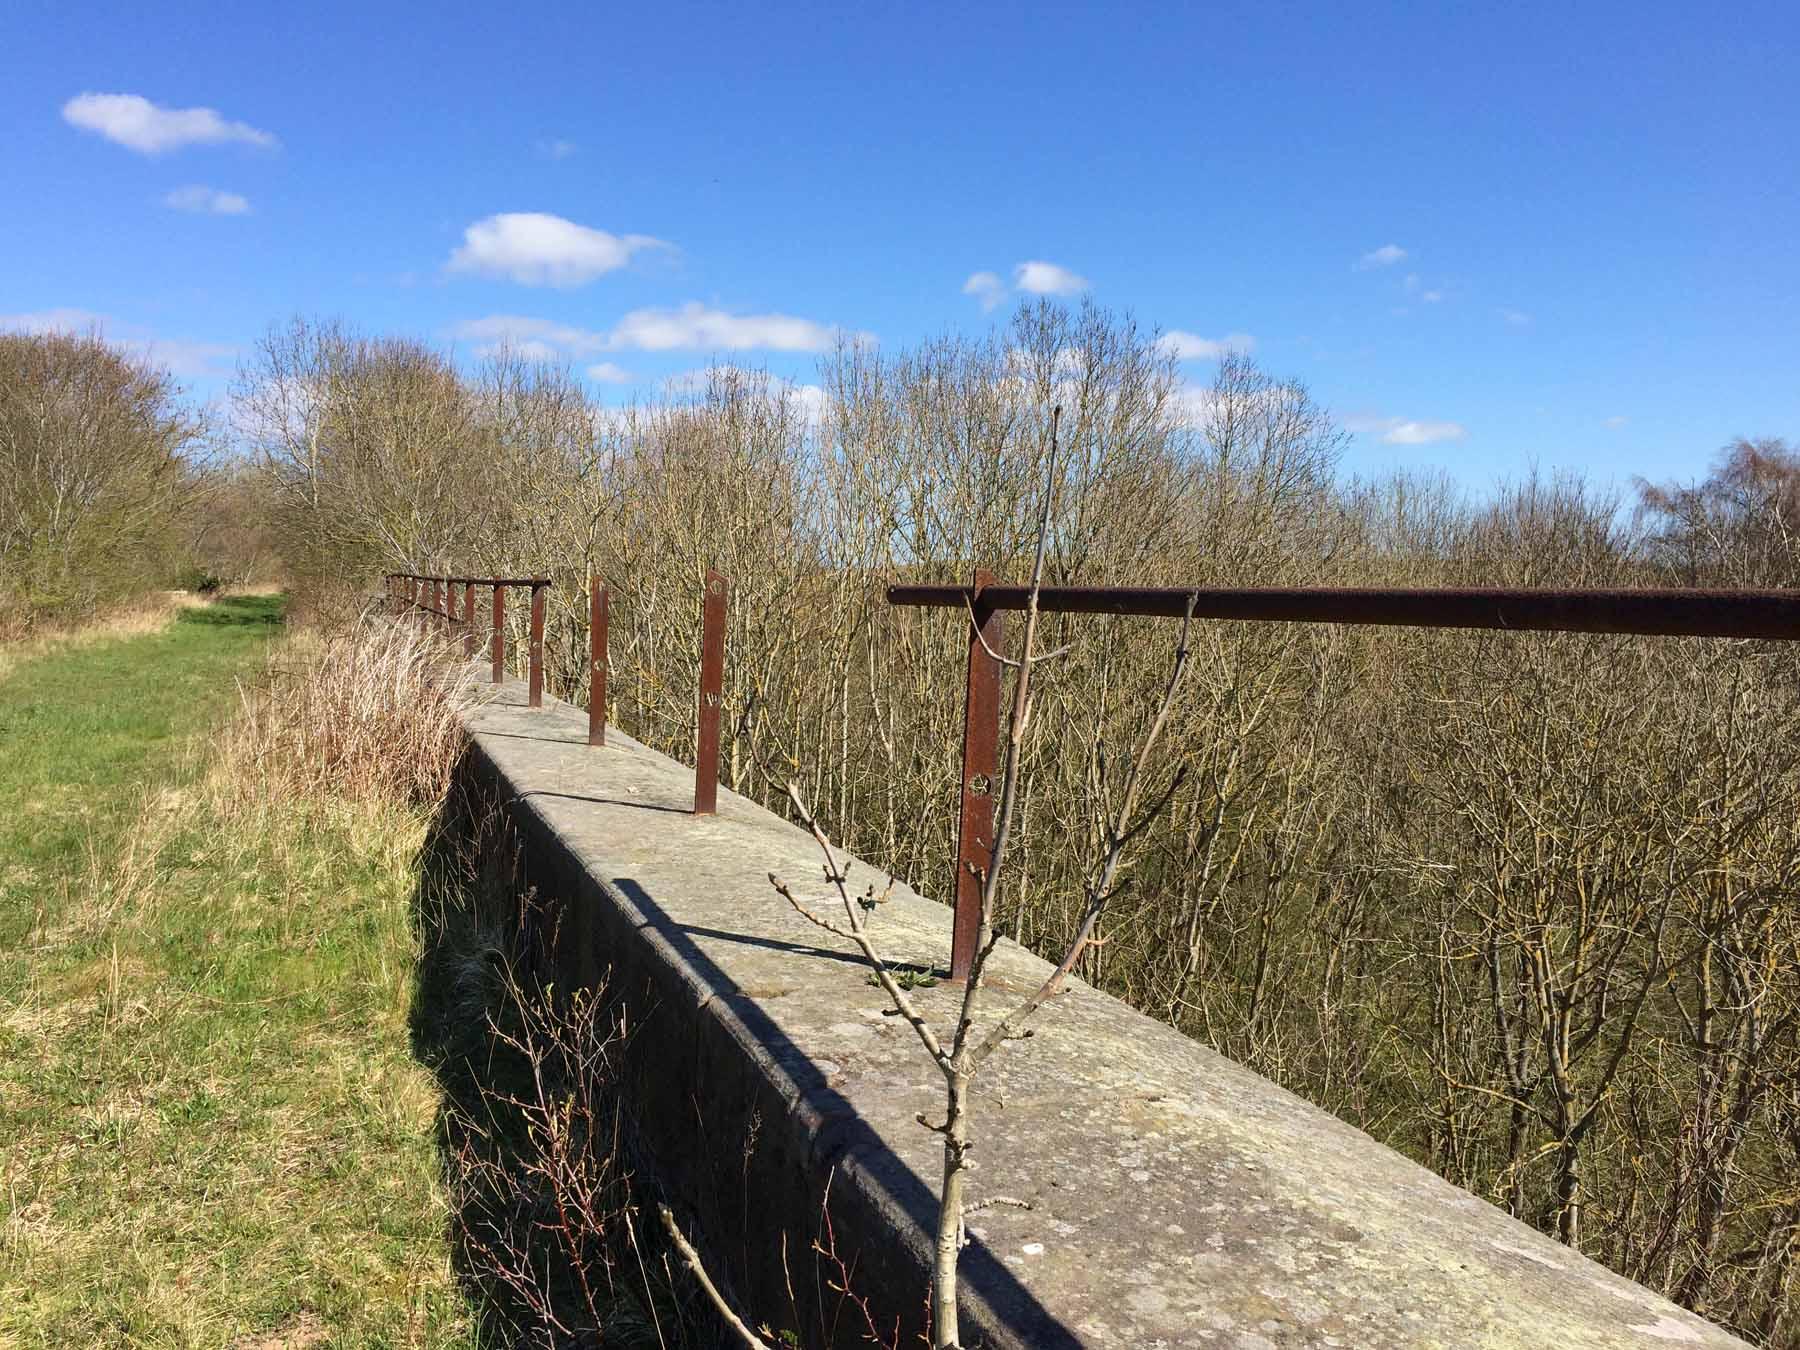 metal rails on bridge collapsing